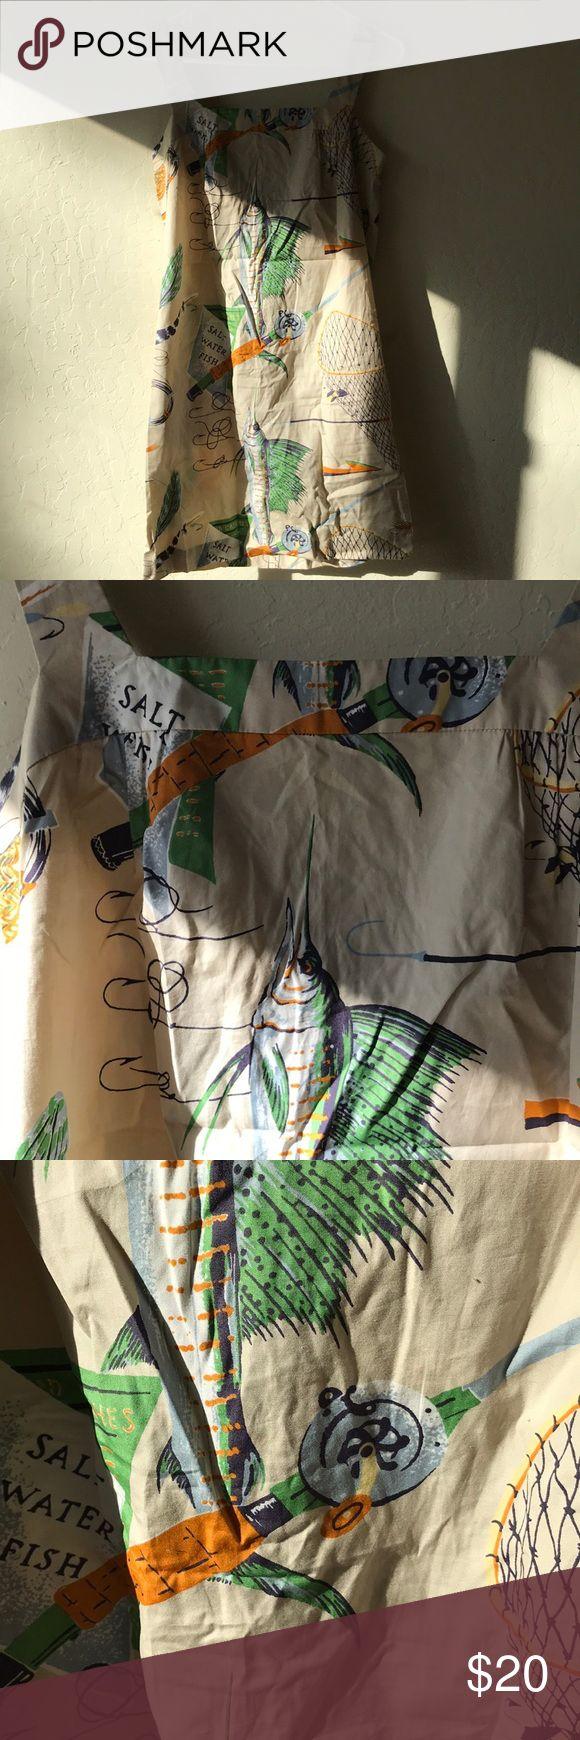 "NWOT J.crew salt water fish print cotton dress Brand new bust 33""length 34"" J. Crew Dresses Midi"